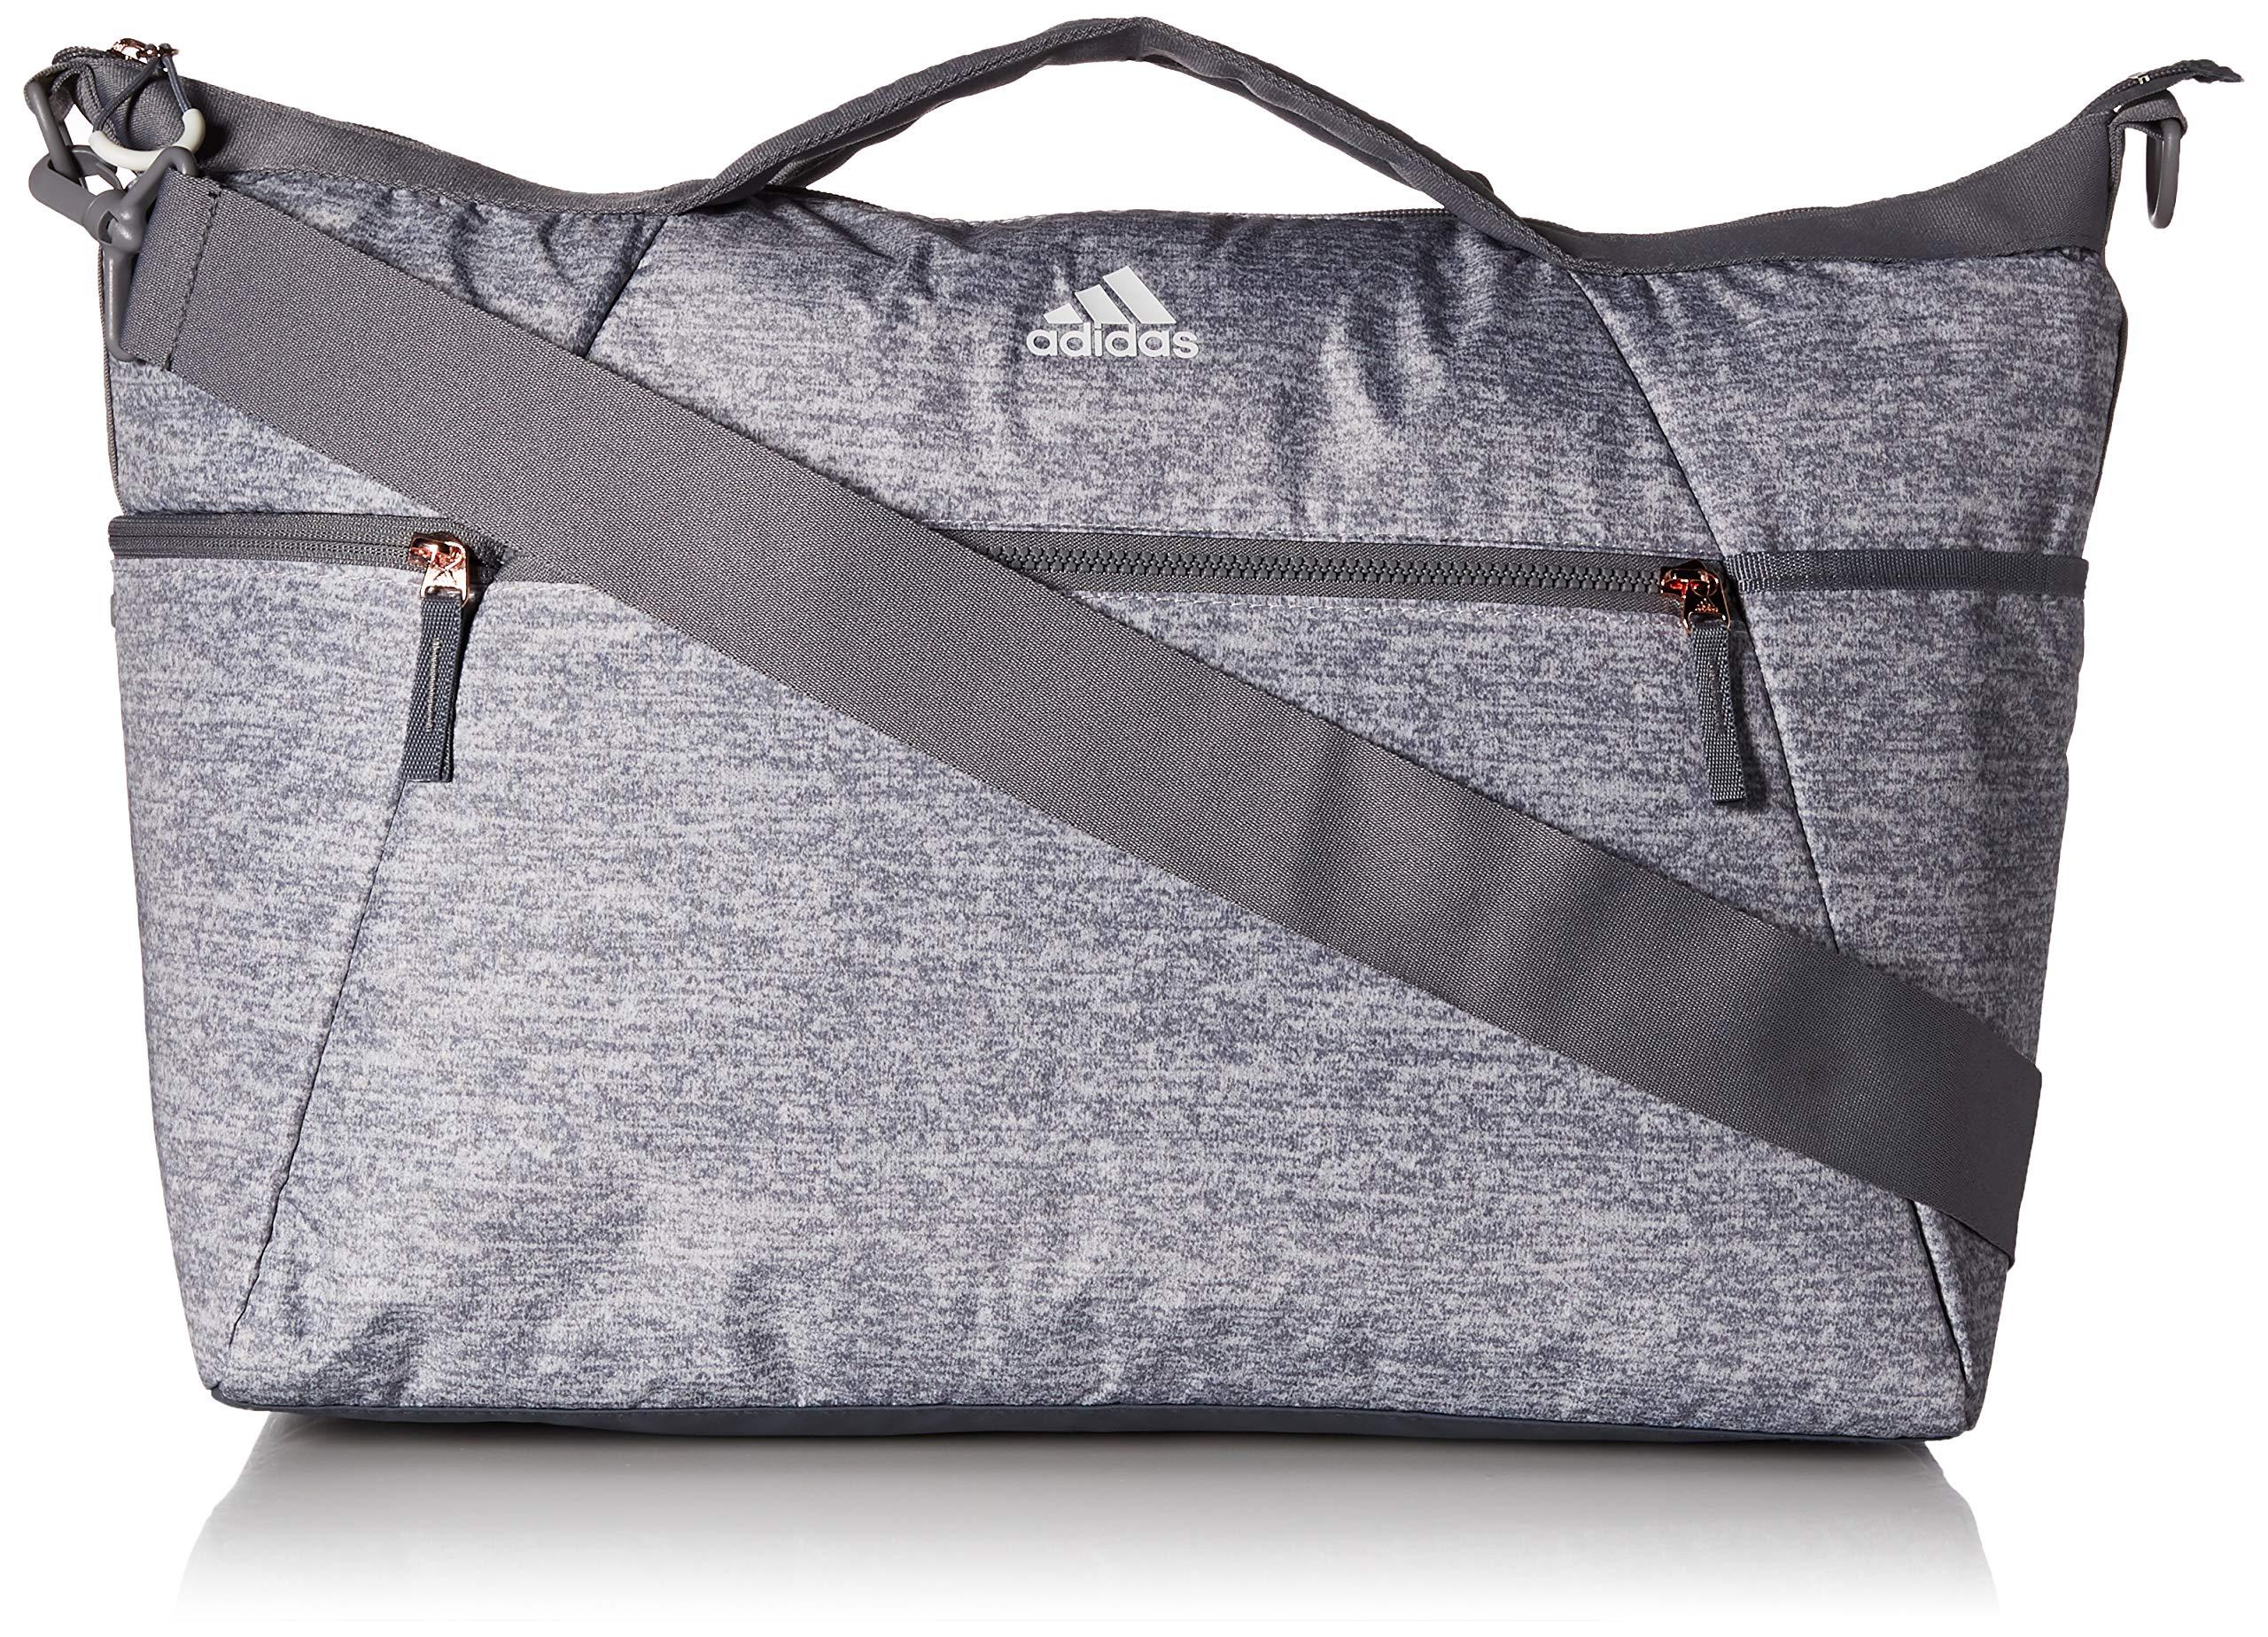 adidas Studio III Duffel Bag, Light Jersey/Grey/Rose Gold, One Size